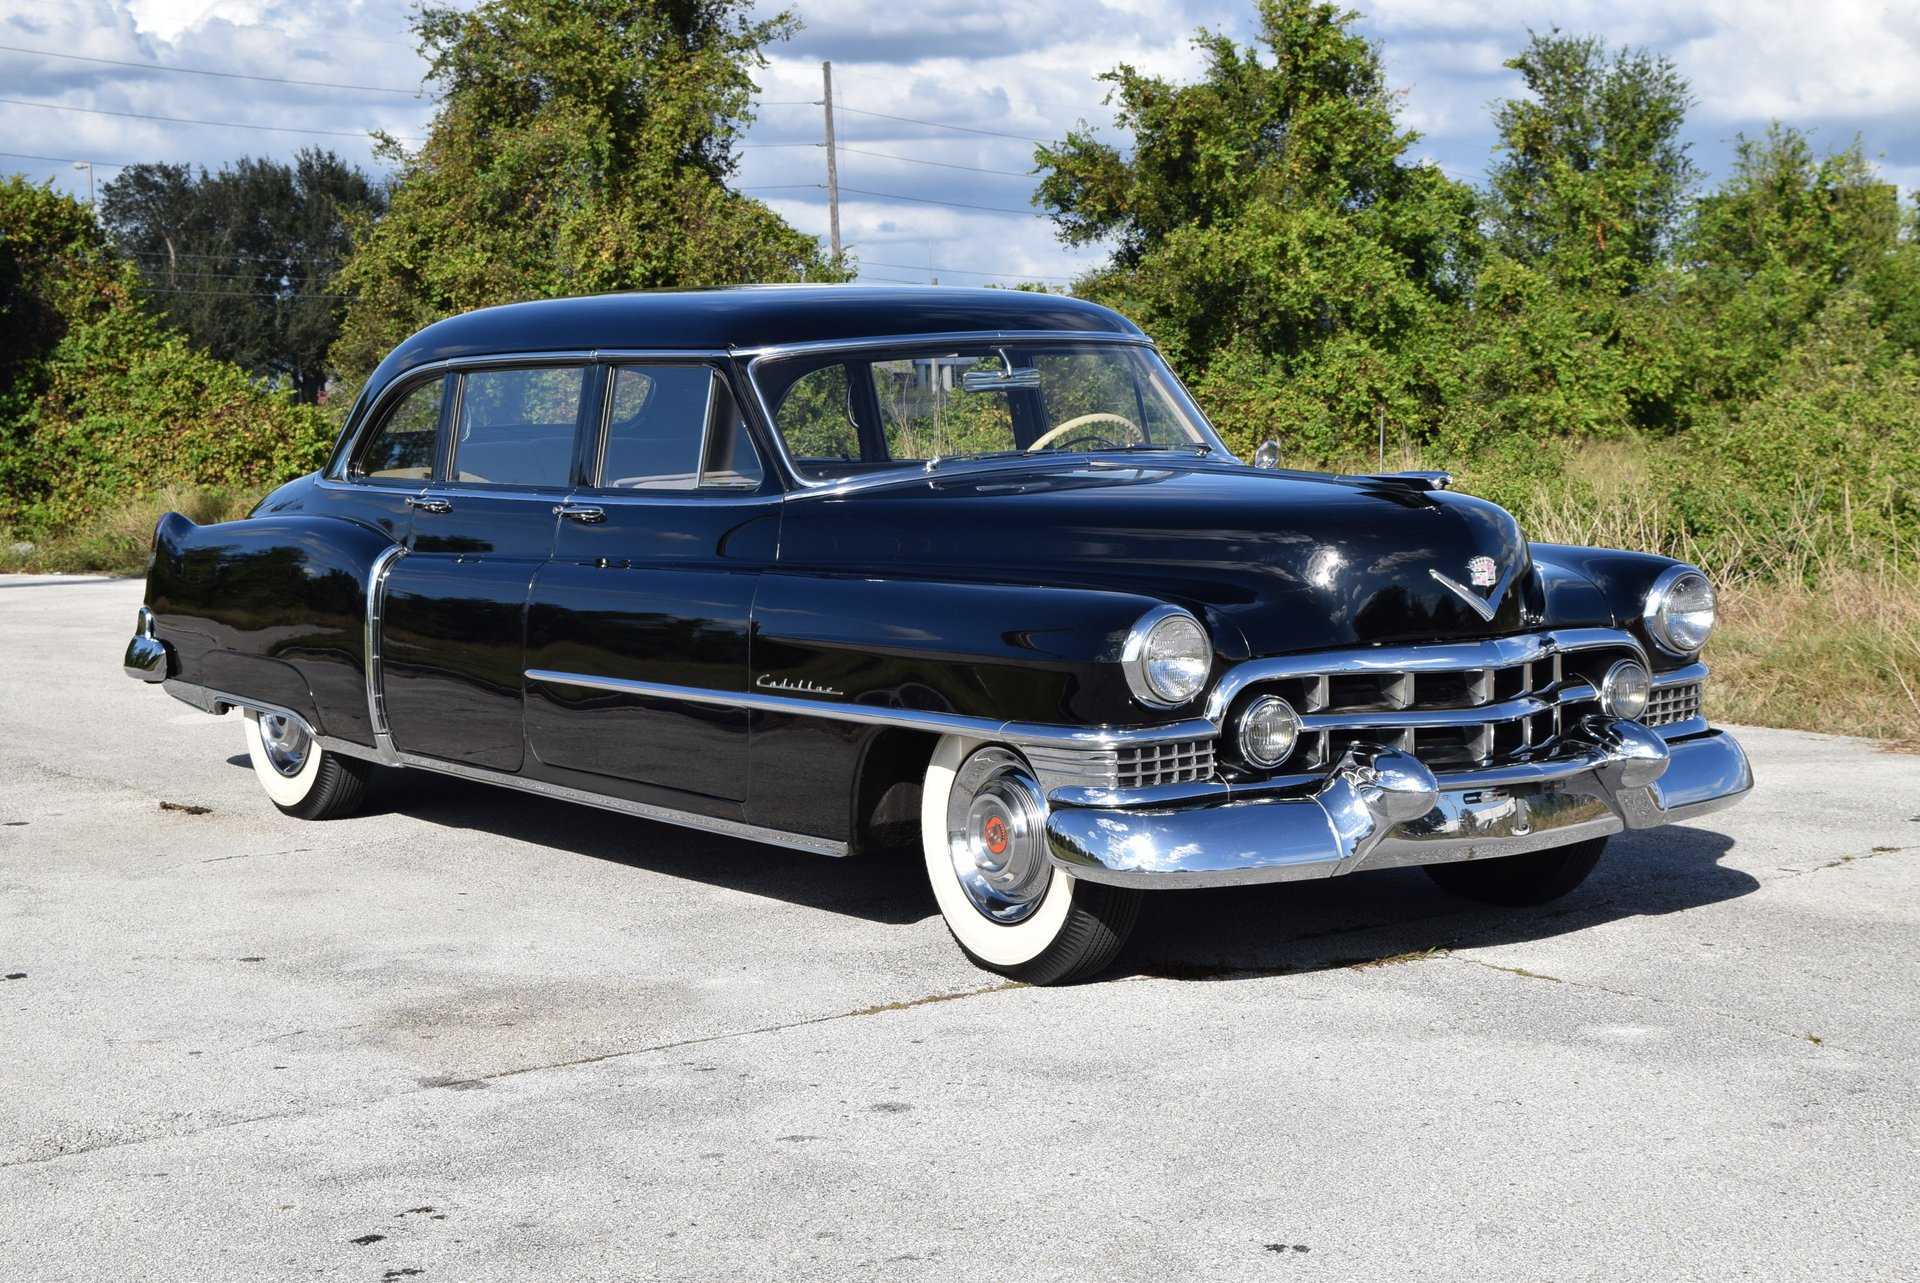 1951 Cadillac Fleetwood 75 Limousine